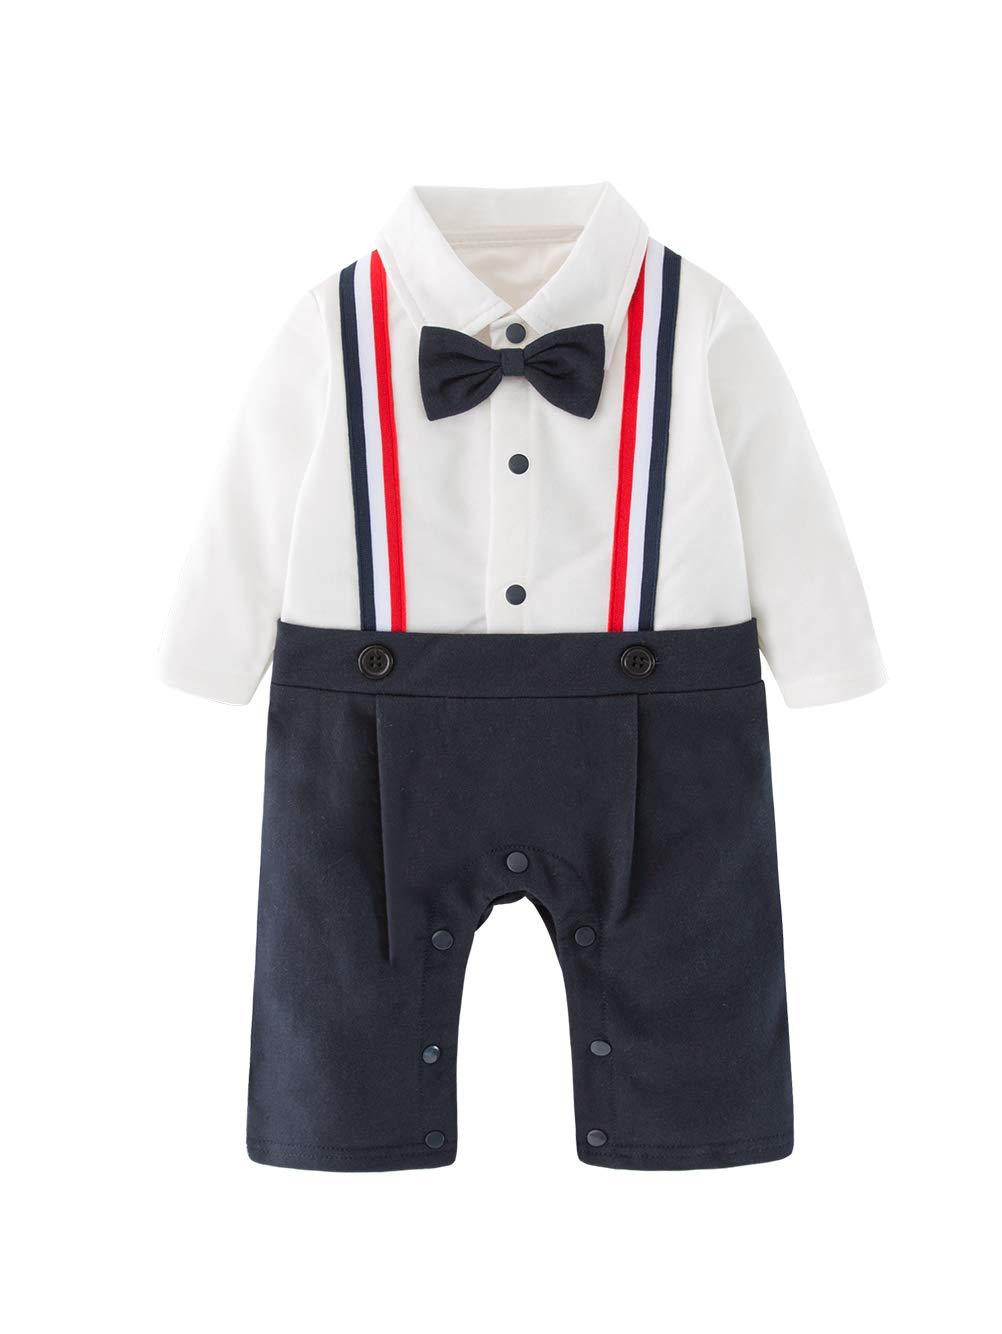 XM Nyan May's Baby Boys Gentleman Bowtie Faux Suspenders Romper Onesie